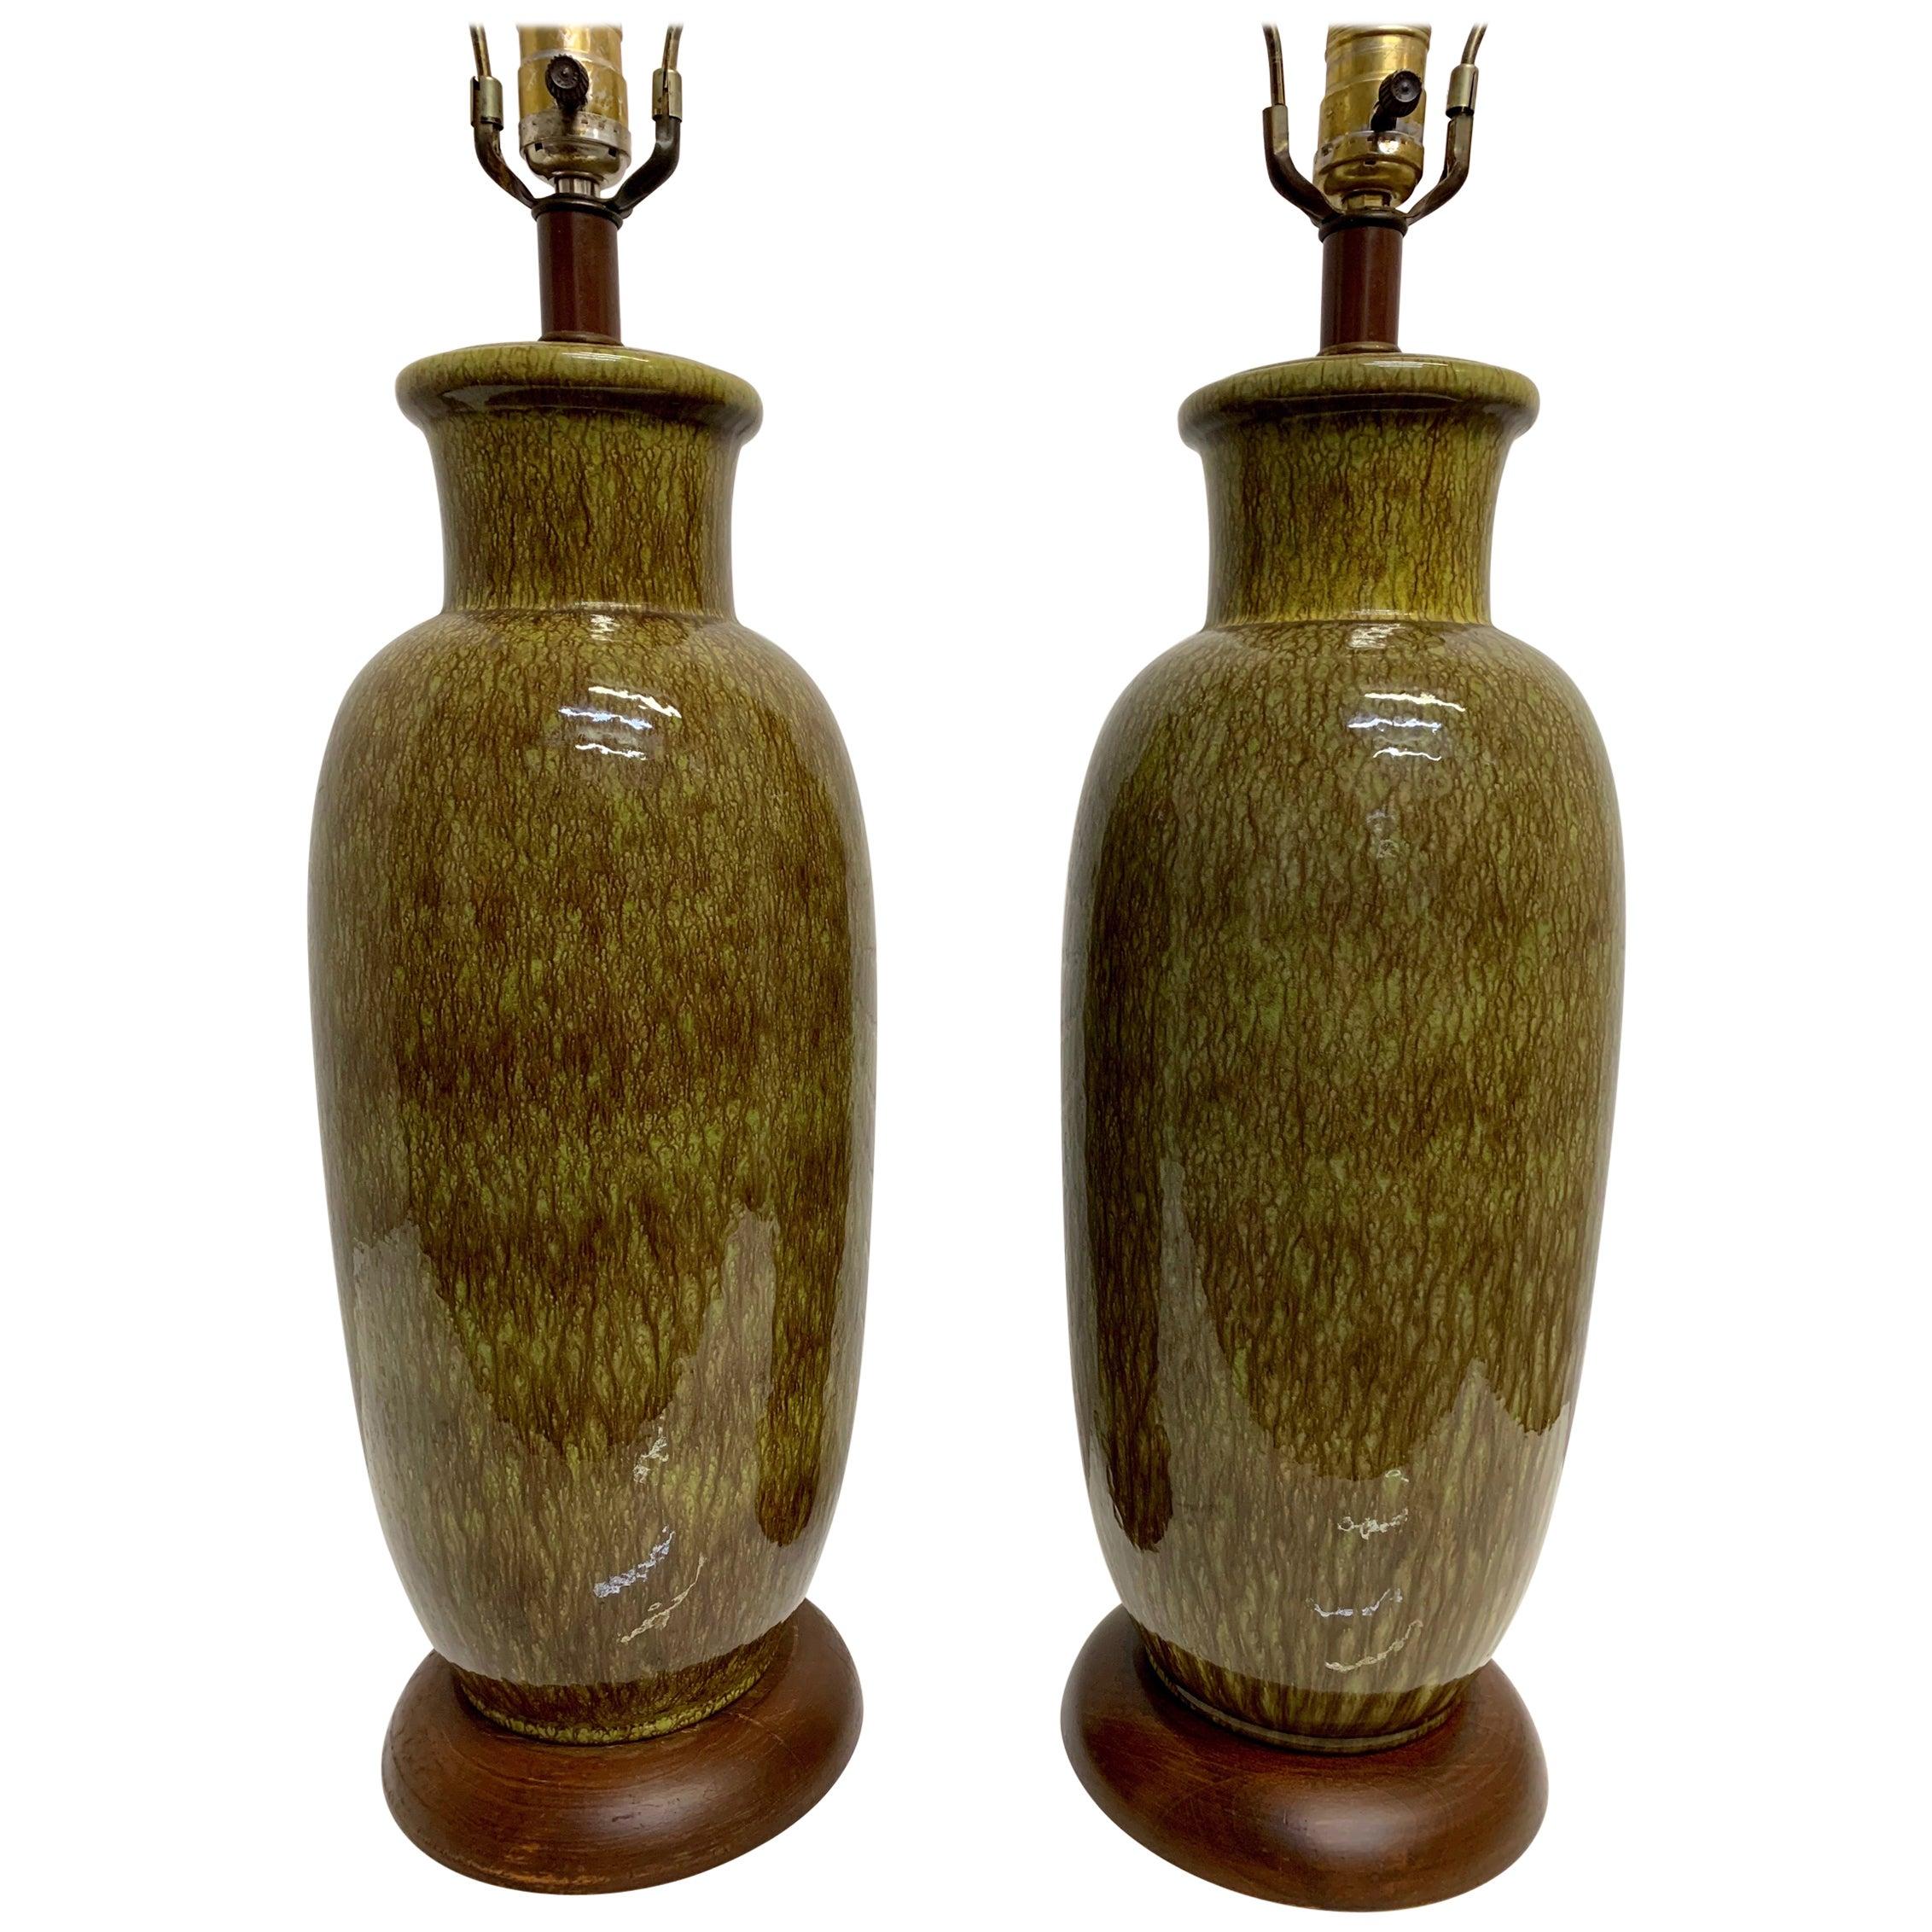 Midcentury Ceramic Table Lamps